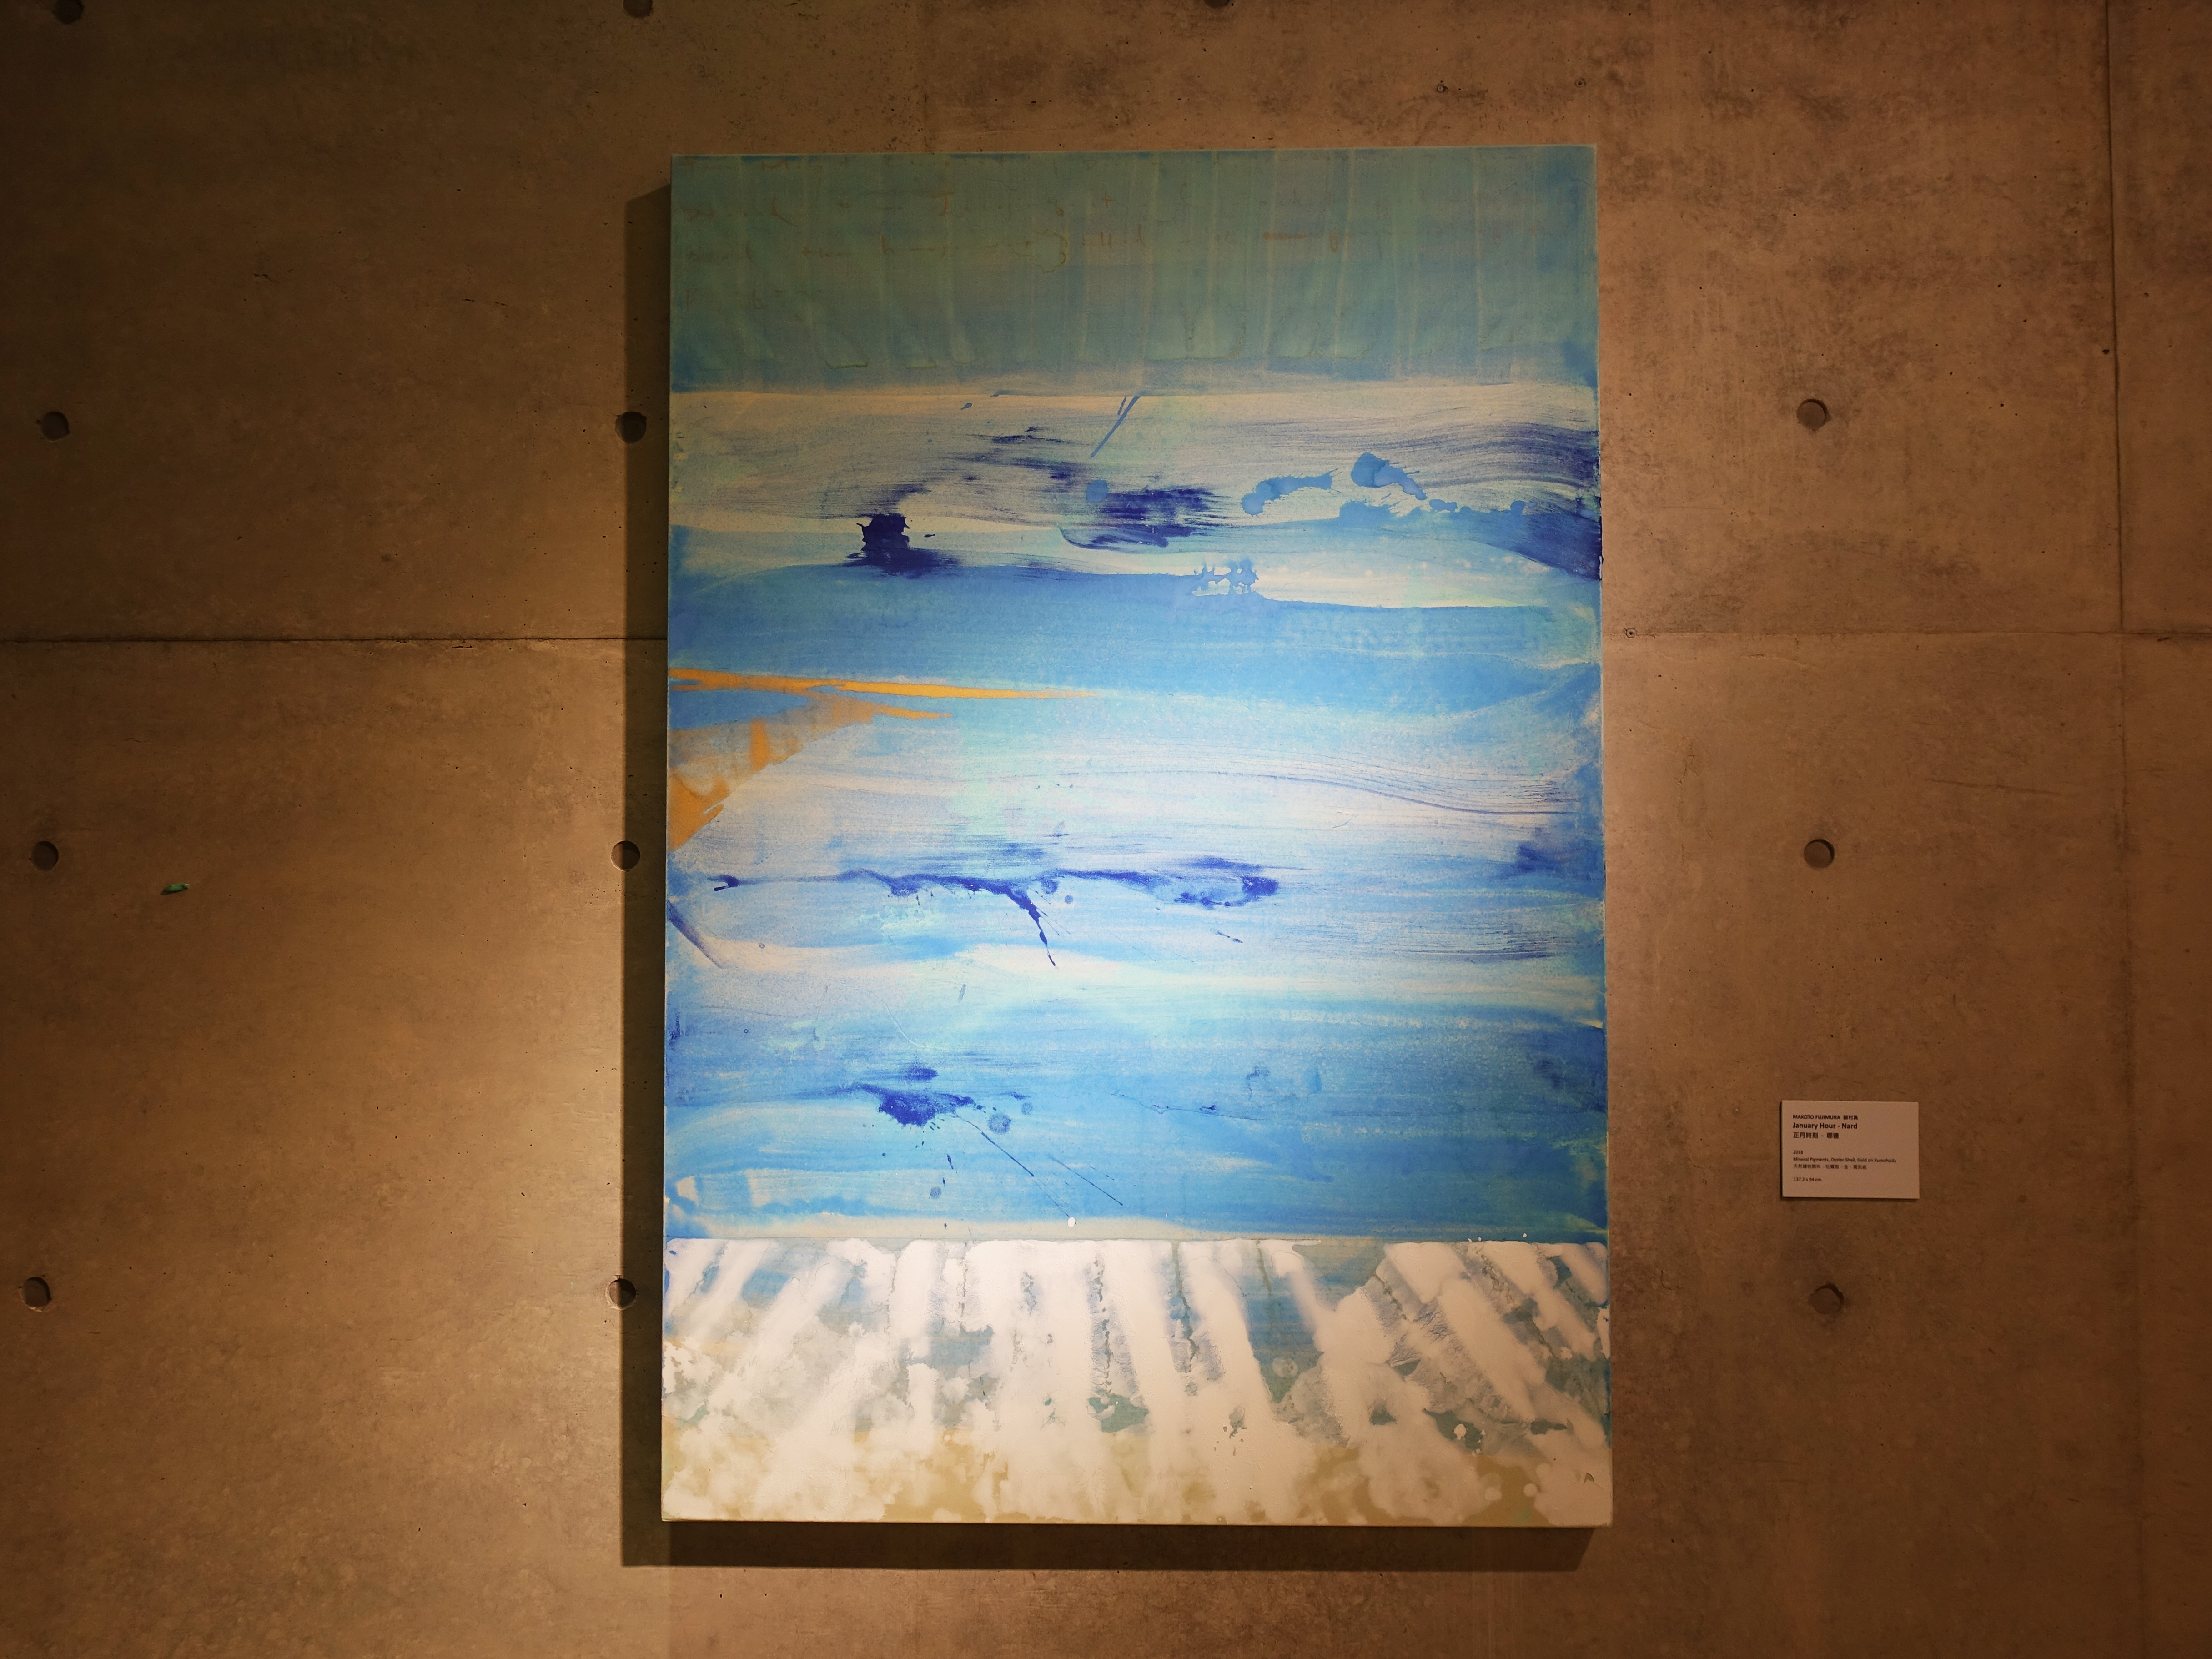 Makoto Fujimura,《January Hour-Nard》,137.2 x 94 cm,天然礦物顏料、牡蠣殼、金、雲肌紙,2018。